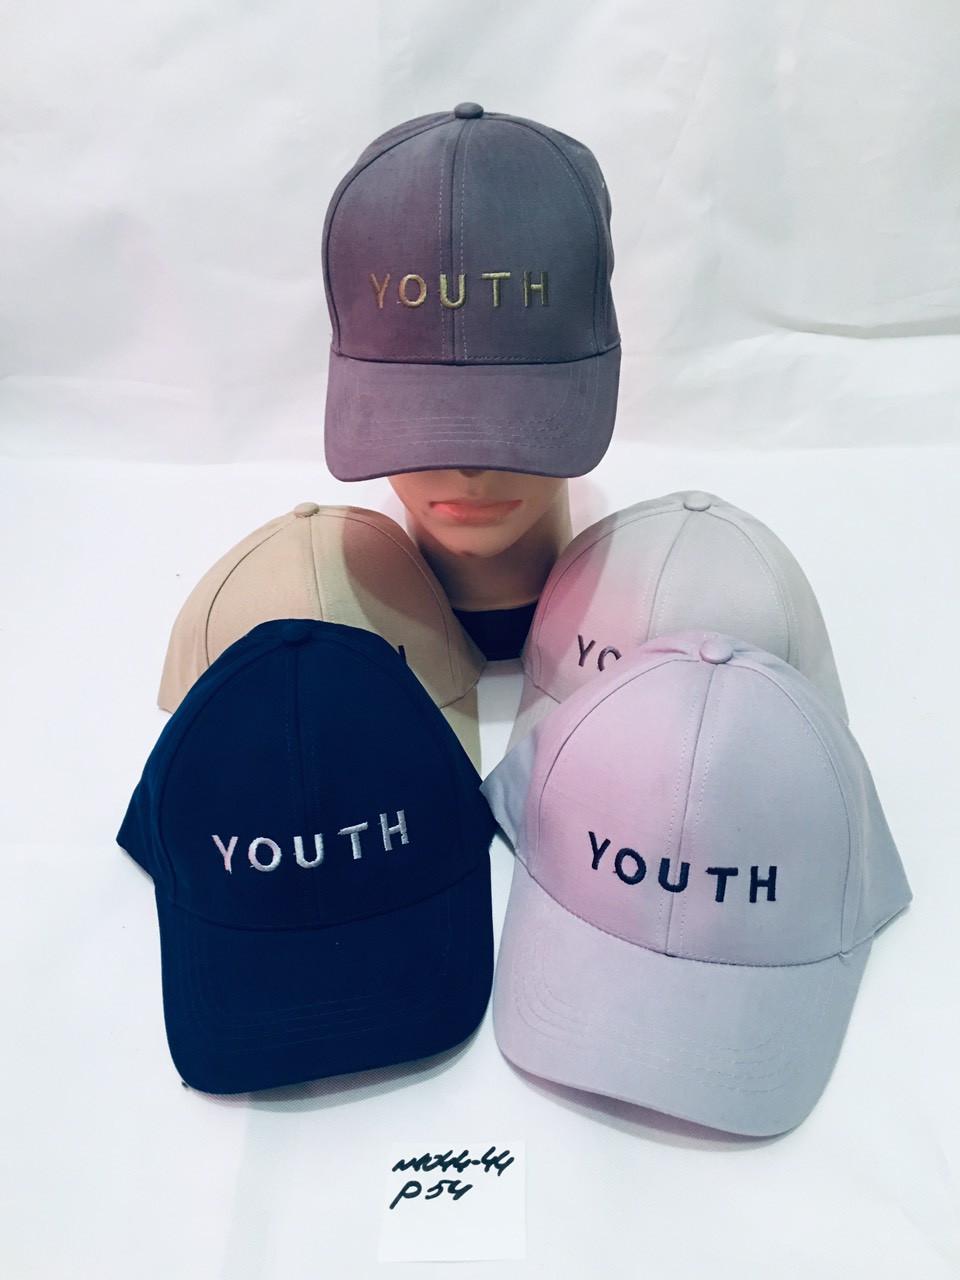 Летняя кепка для мальчика Youth р.54